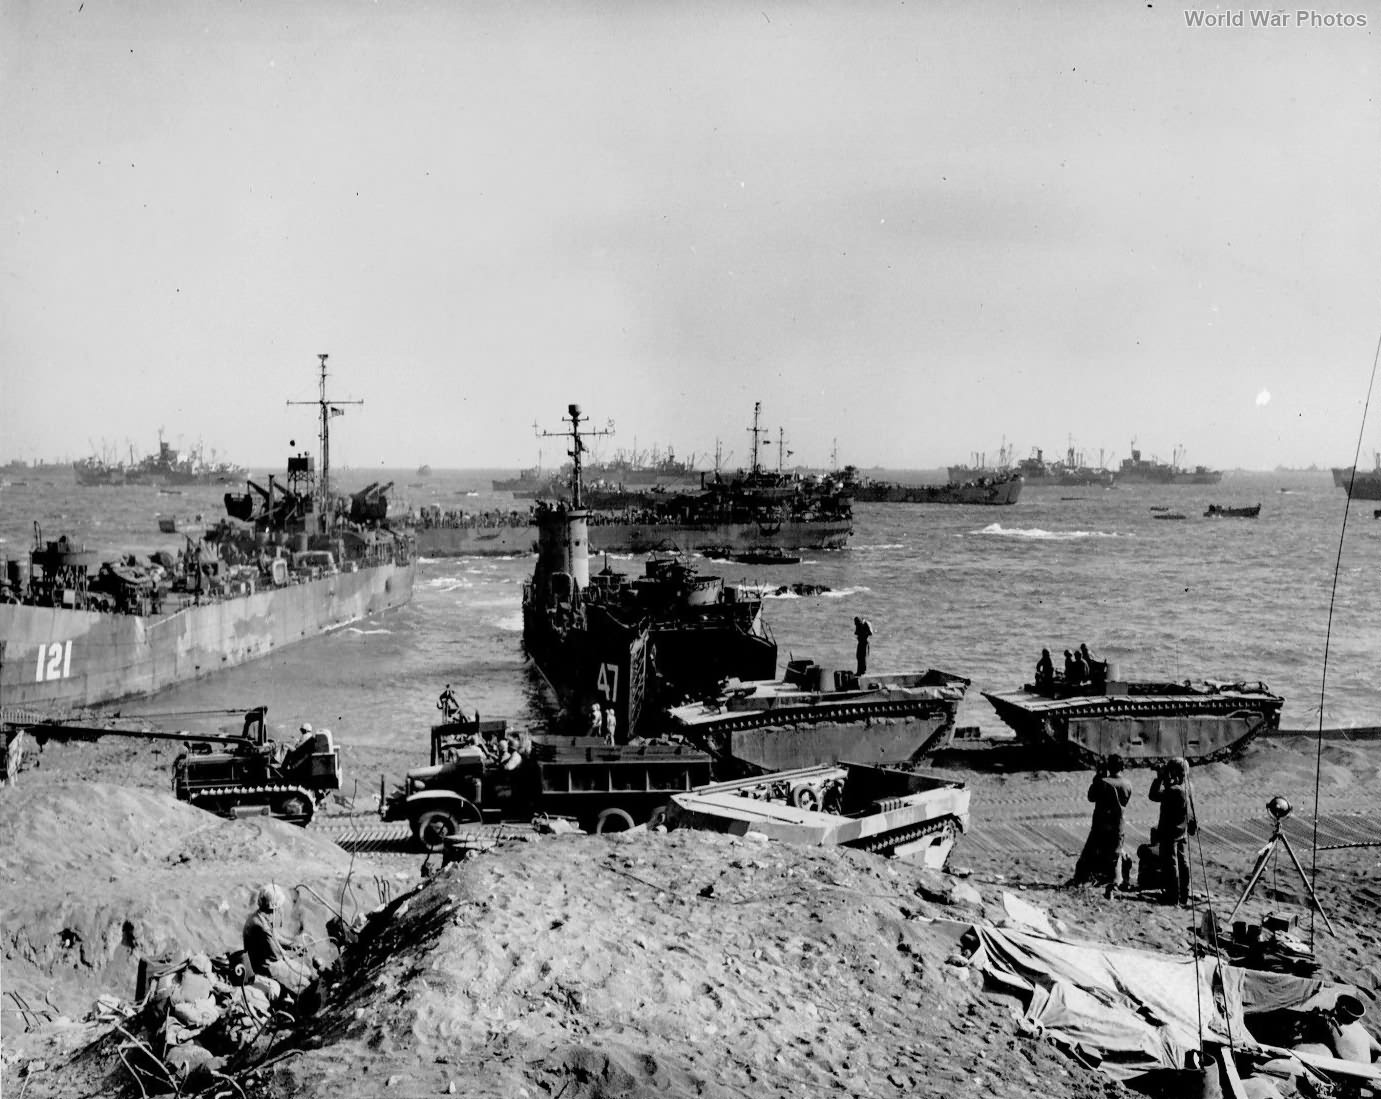 Equipment and ships on Red Beach 1 Iwo Jima 2